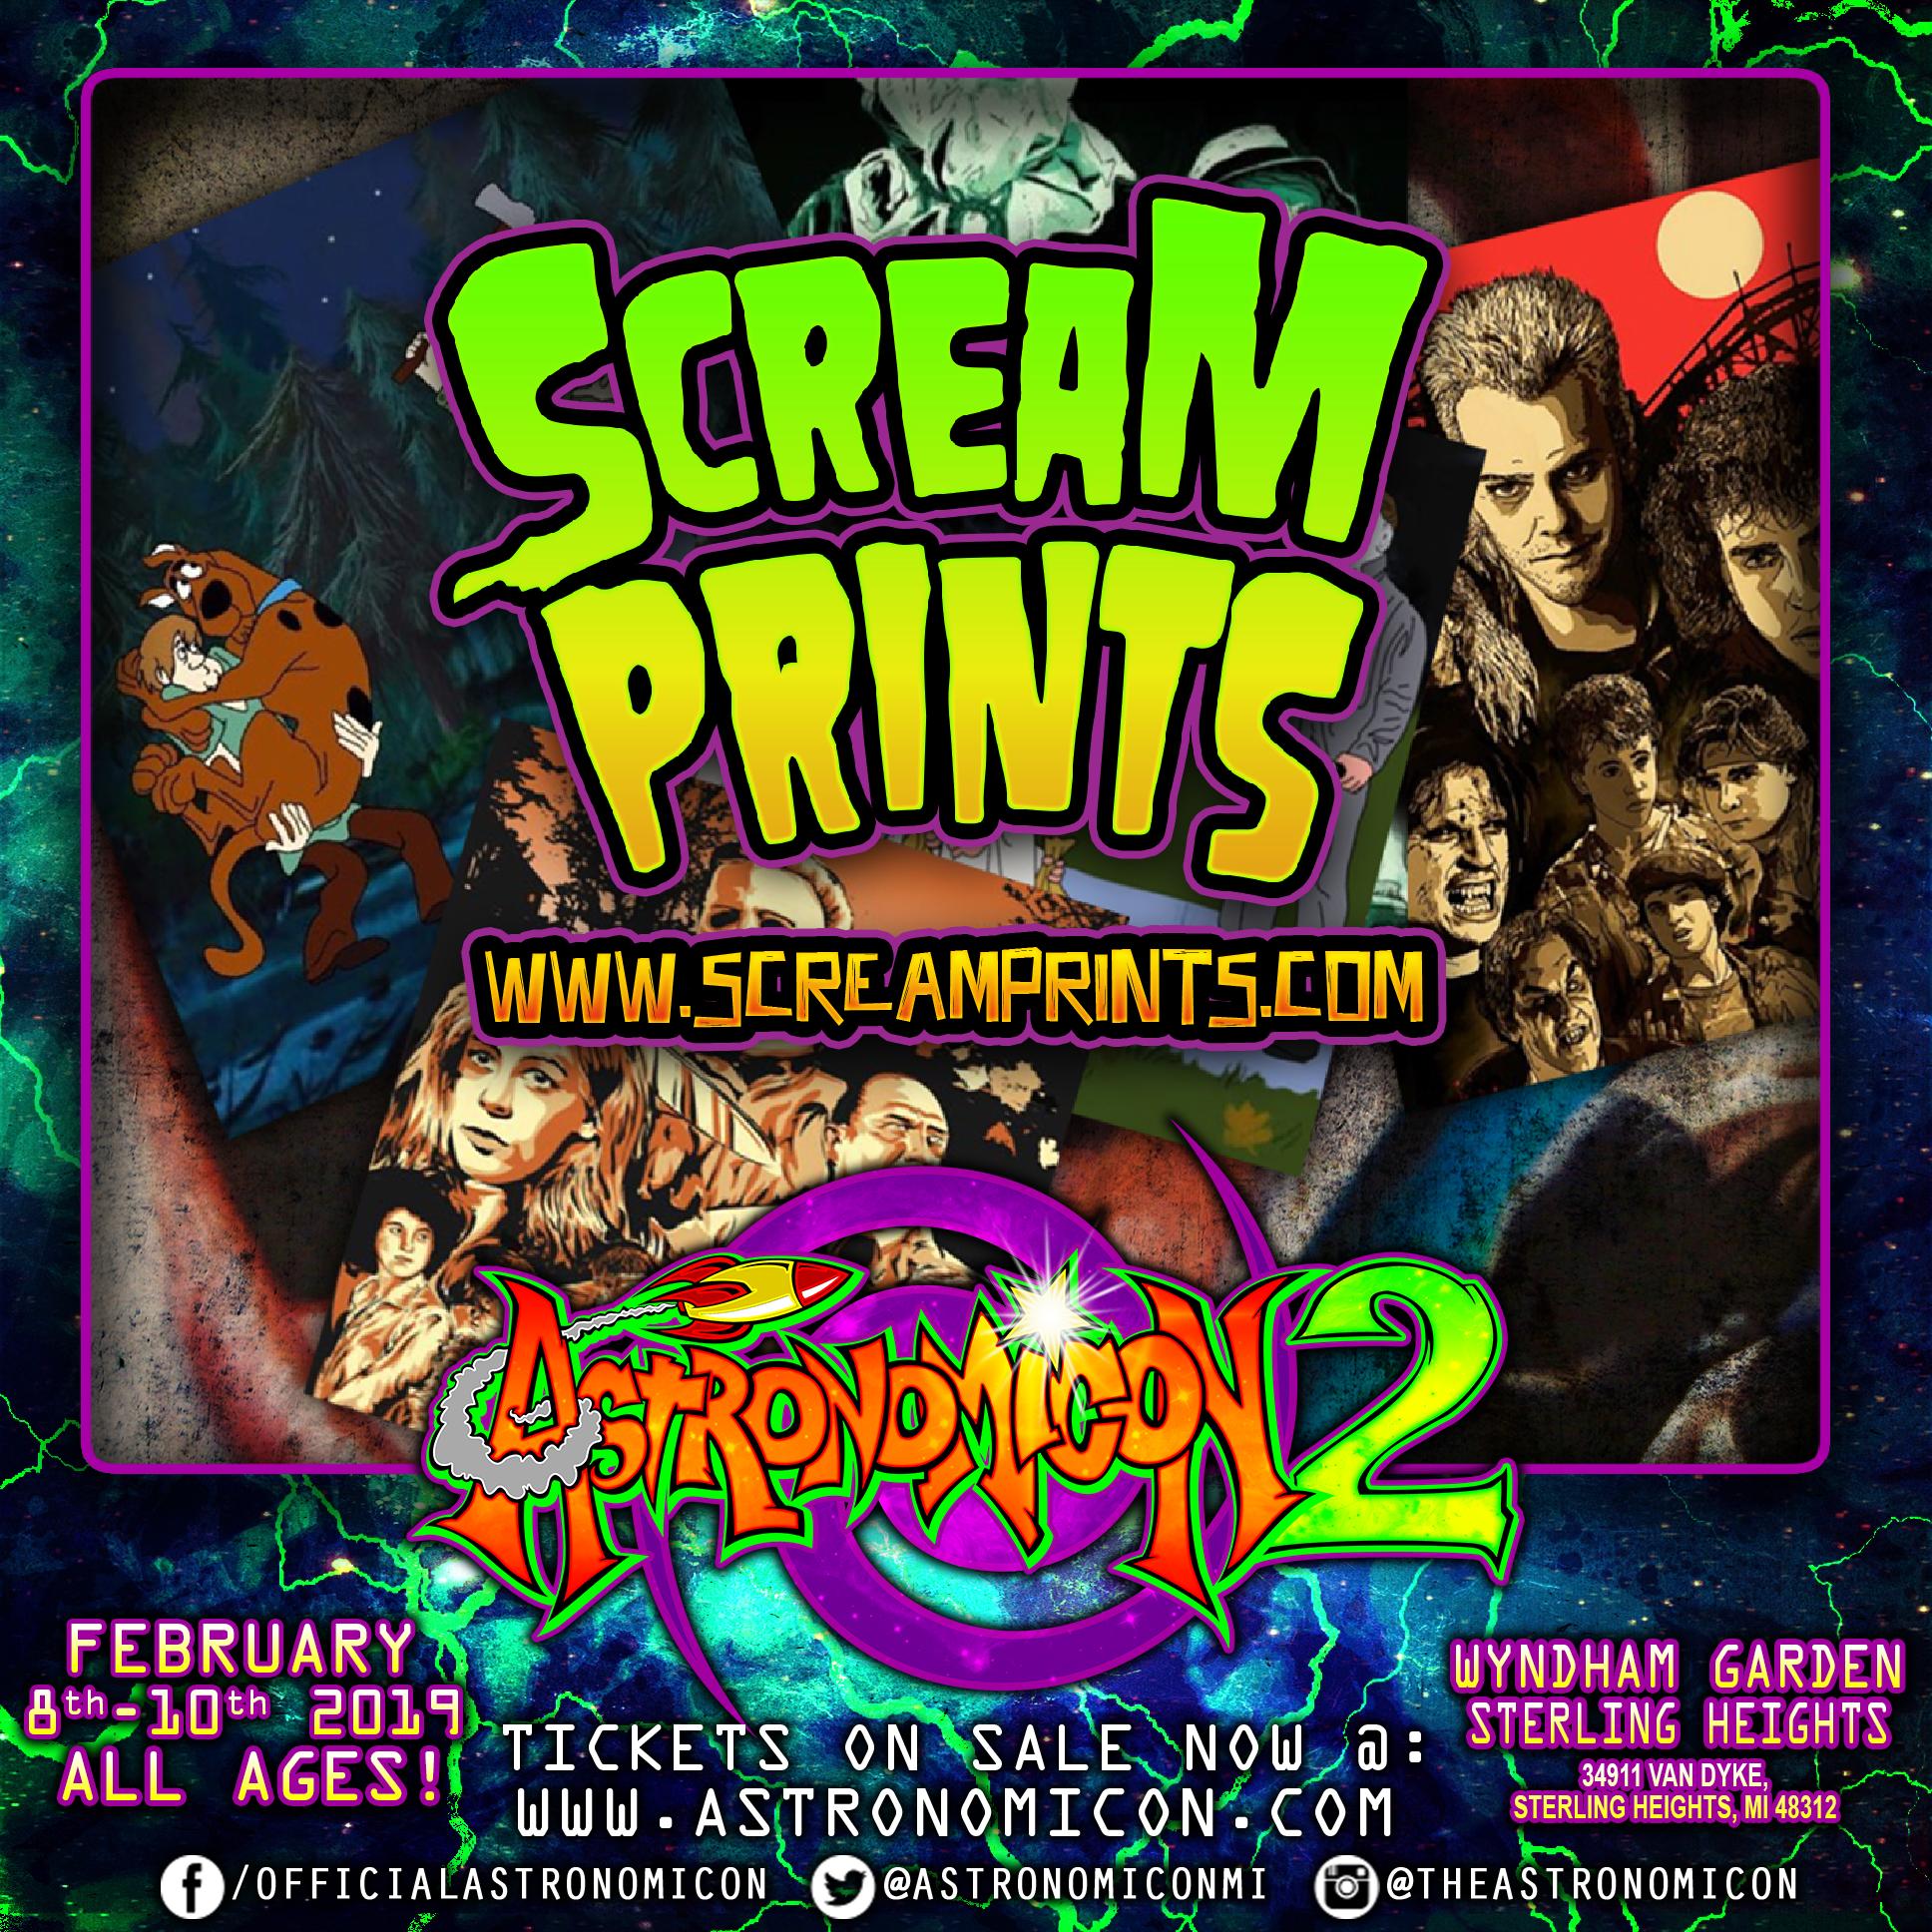 Astronomicon 2 Scream Prints IG Ad.png